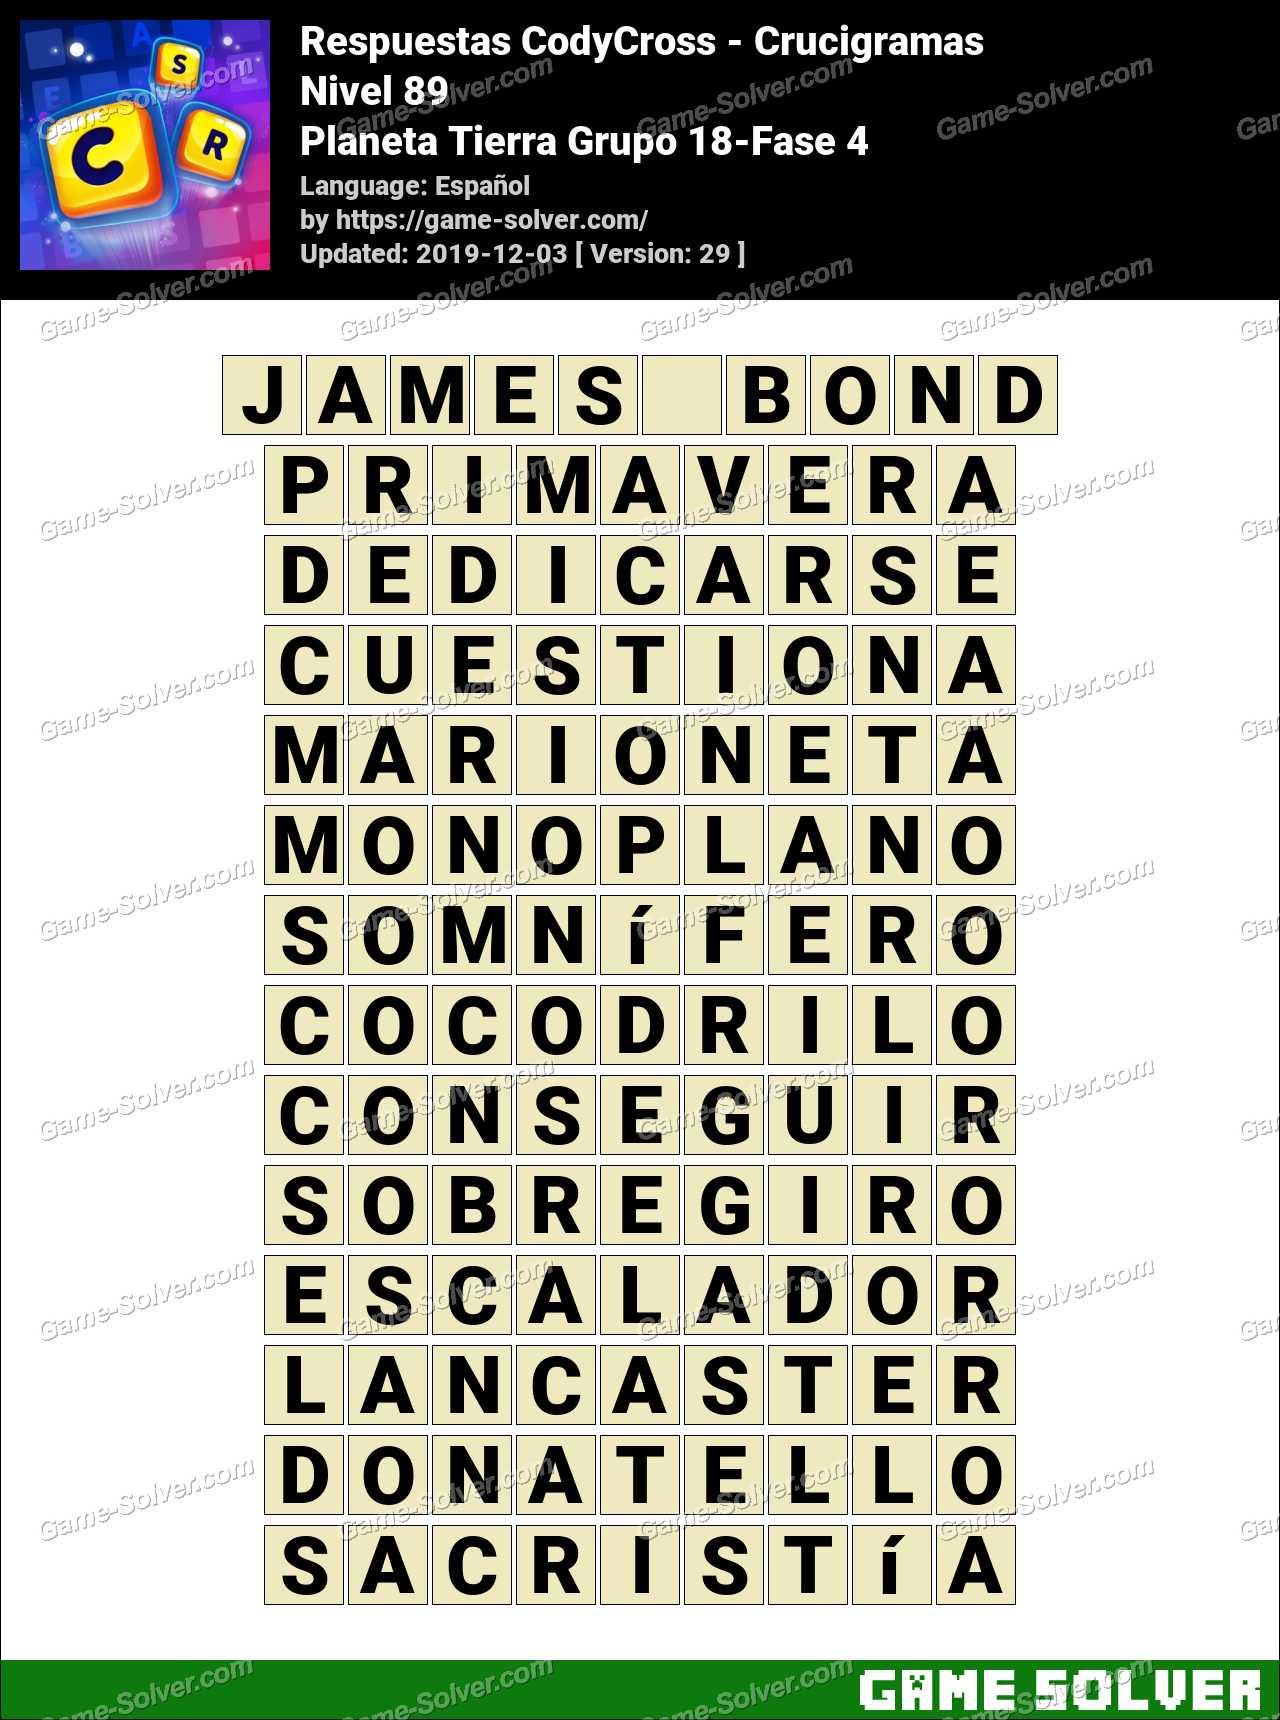 Respuestas CodyCross Planeta Tierra Grupo 18-Fase 4